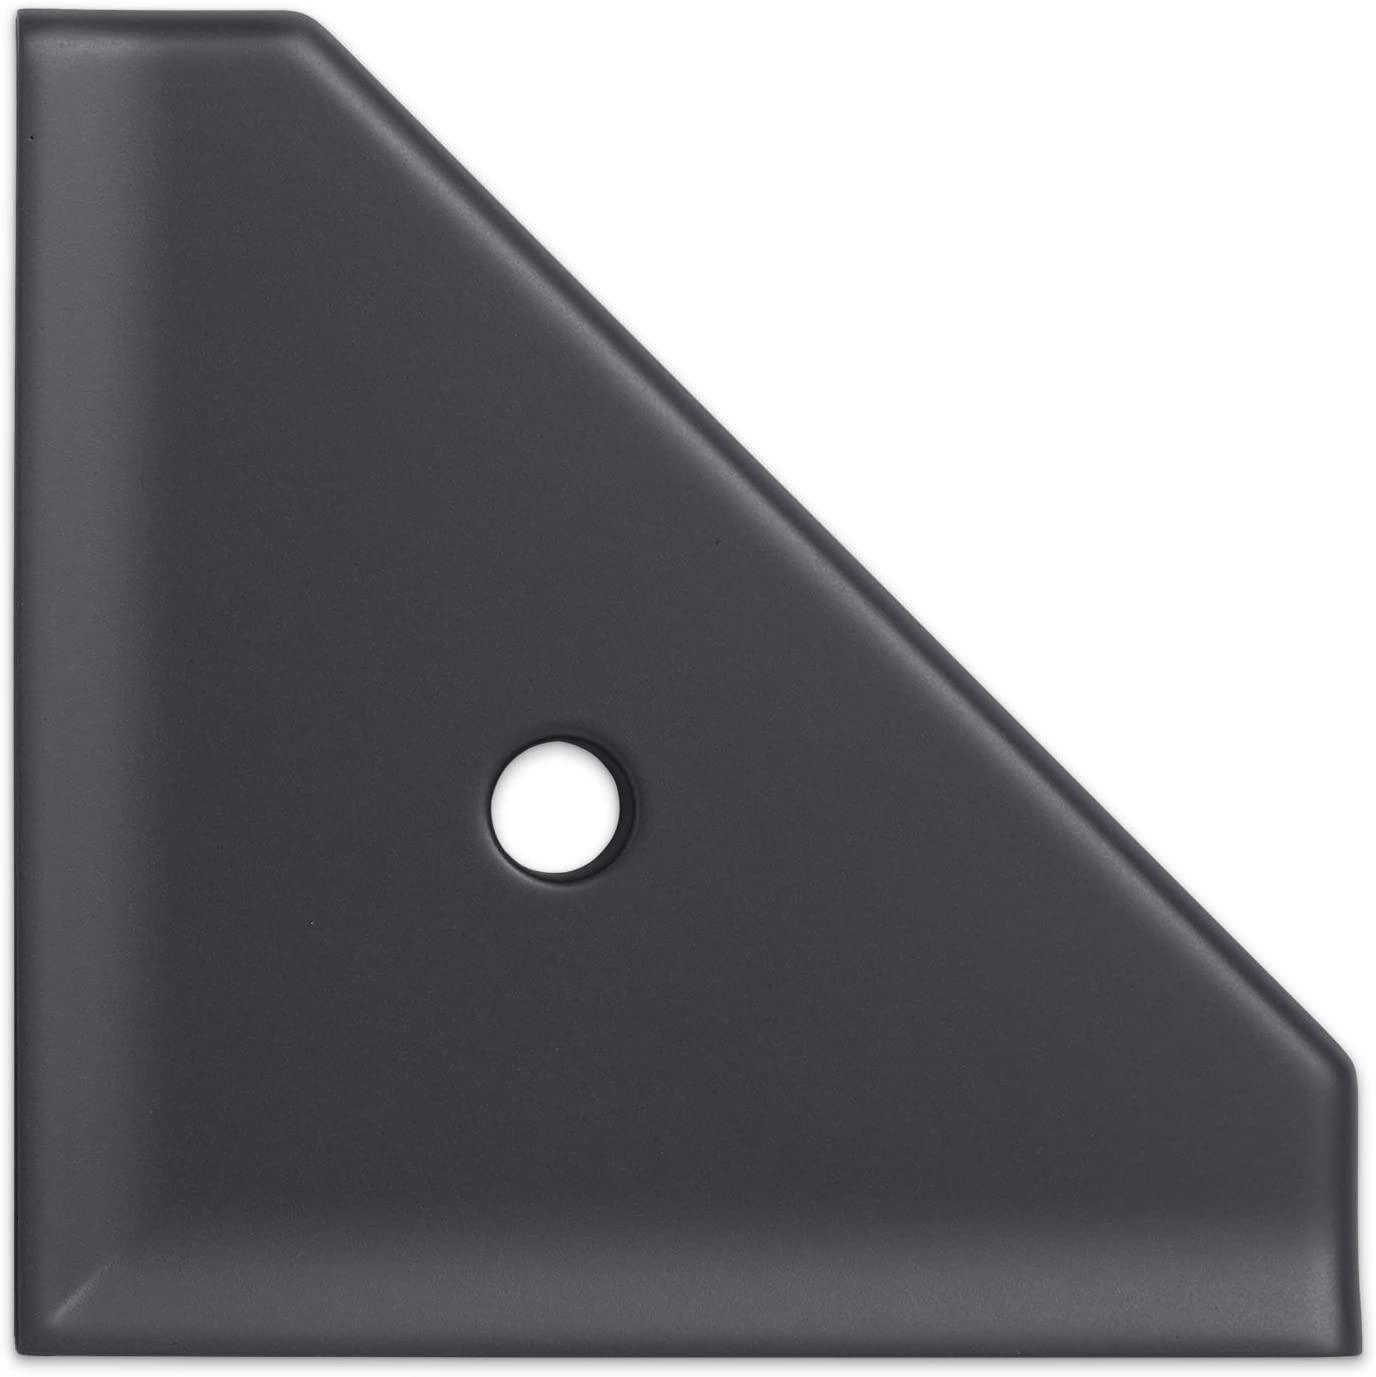 8 inch Corner Shower Shelf - Graphite Black Wall Mounted Bathroom Organizer Geo Flatback